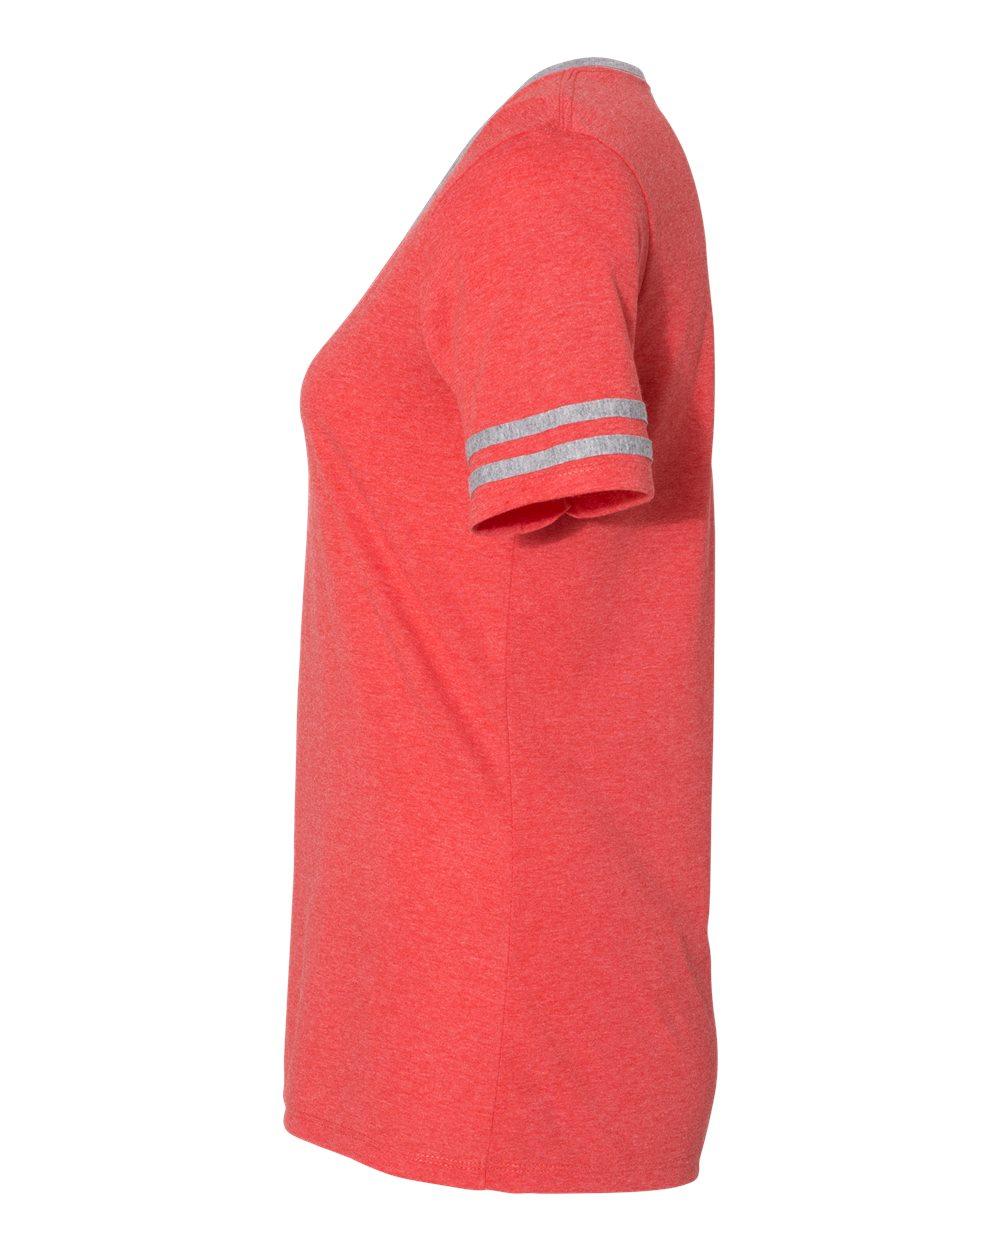 Jerzees-Triblend-Women-039-s-V-Neck-Varsity-T-Shirt-602WVR thumbnail 11